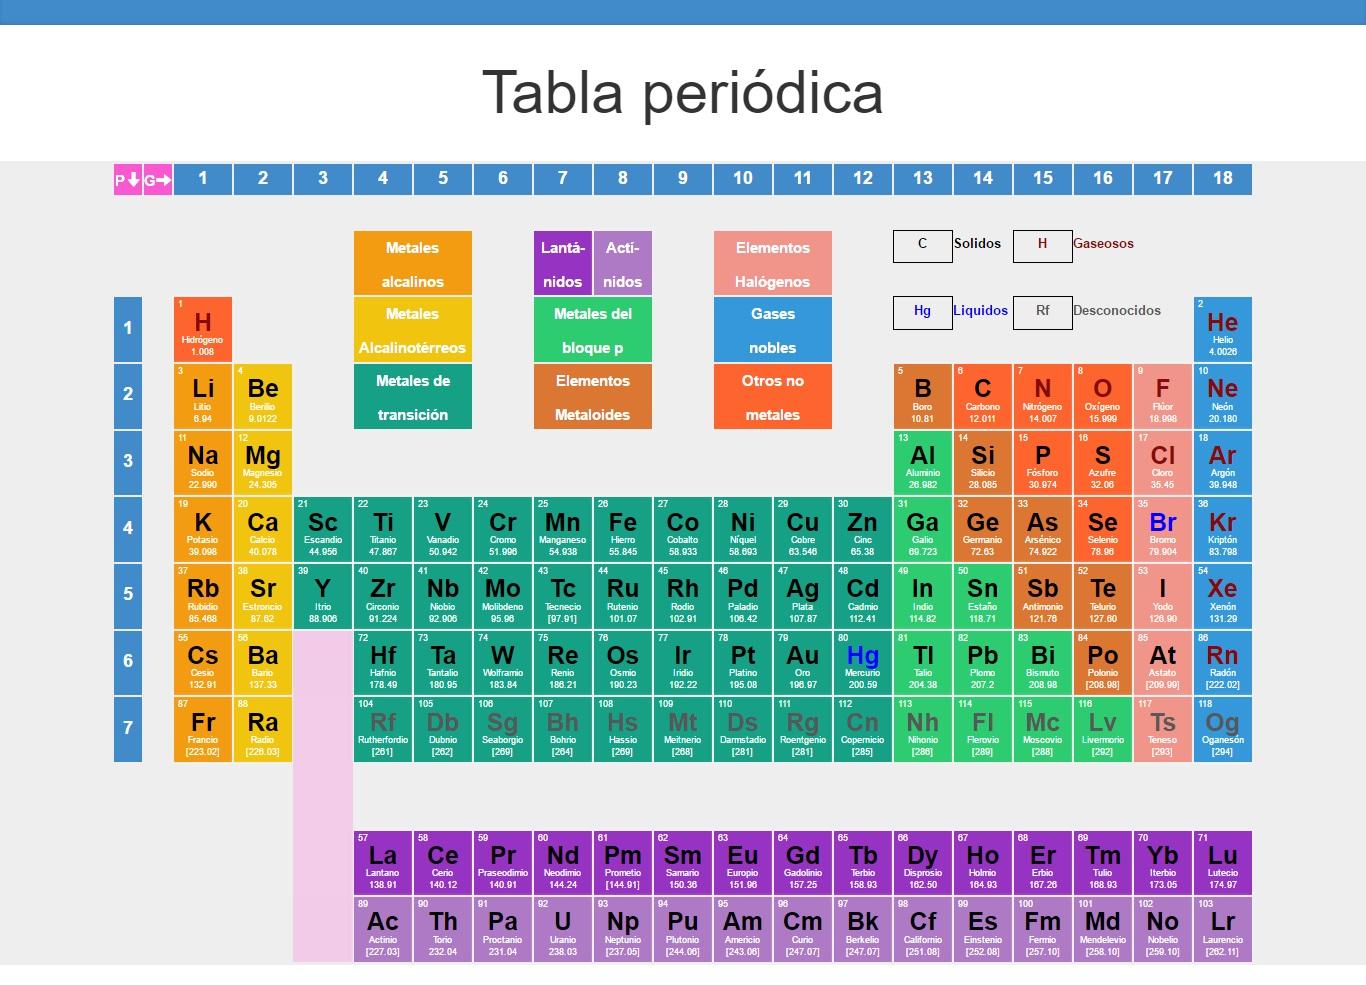 Tabla peridica elementos qumicos significado imgen tabla peridica urtaz Images